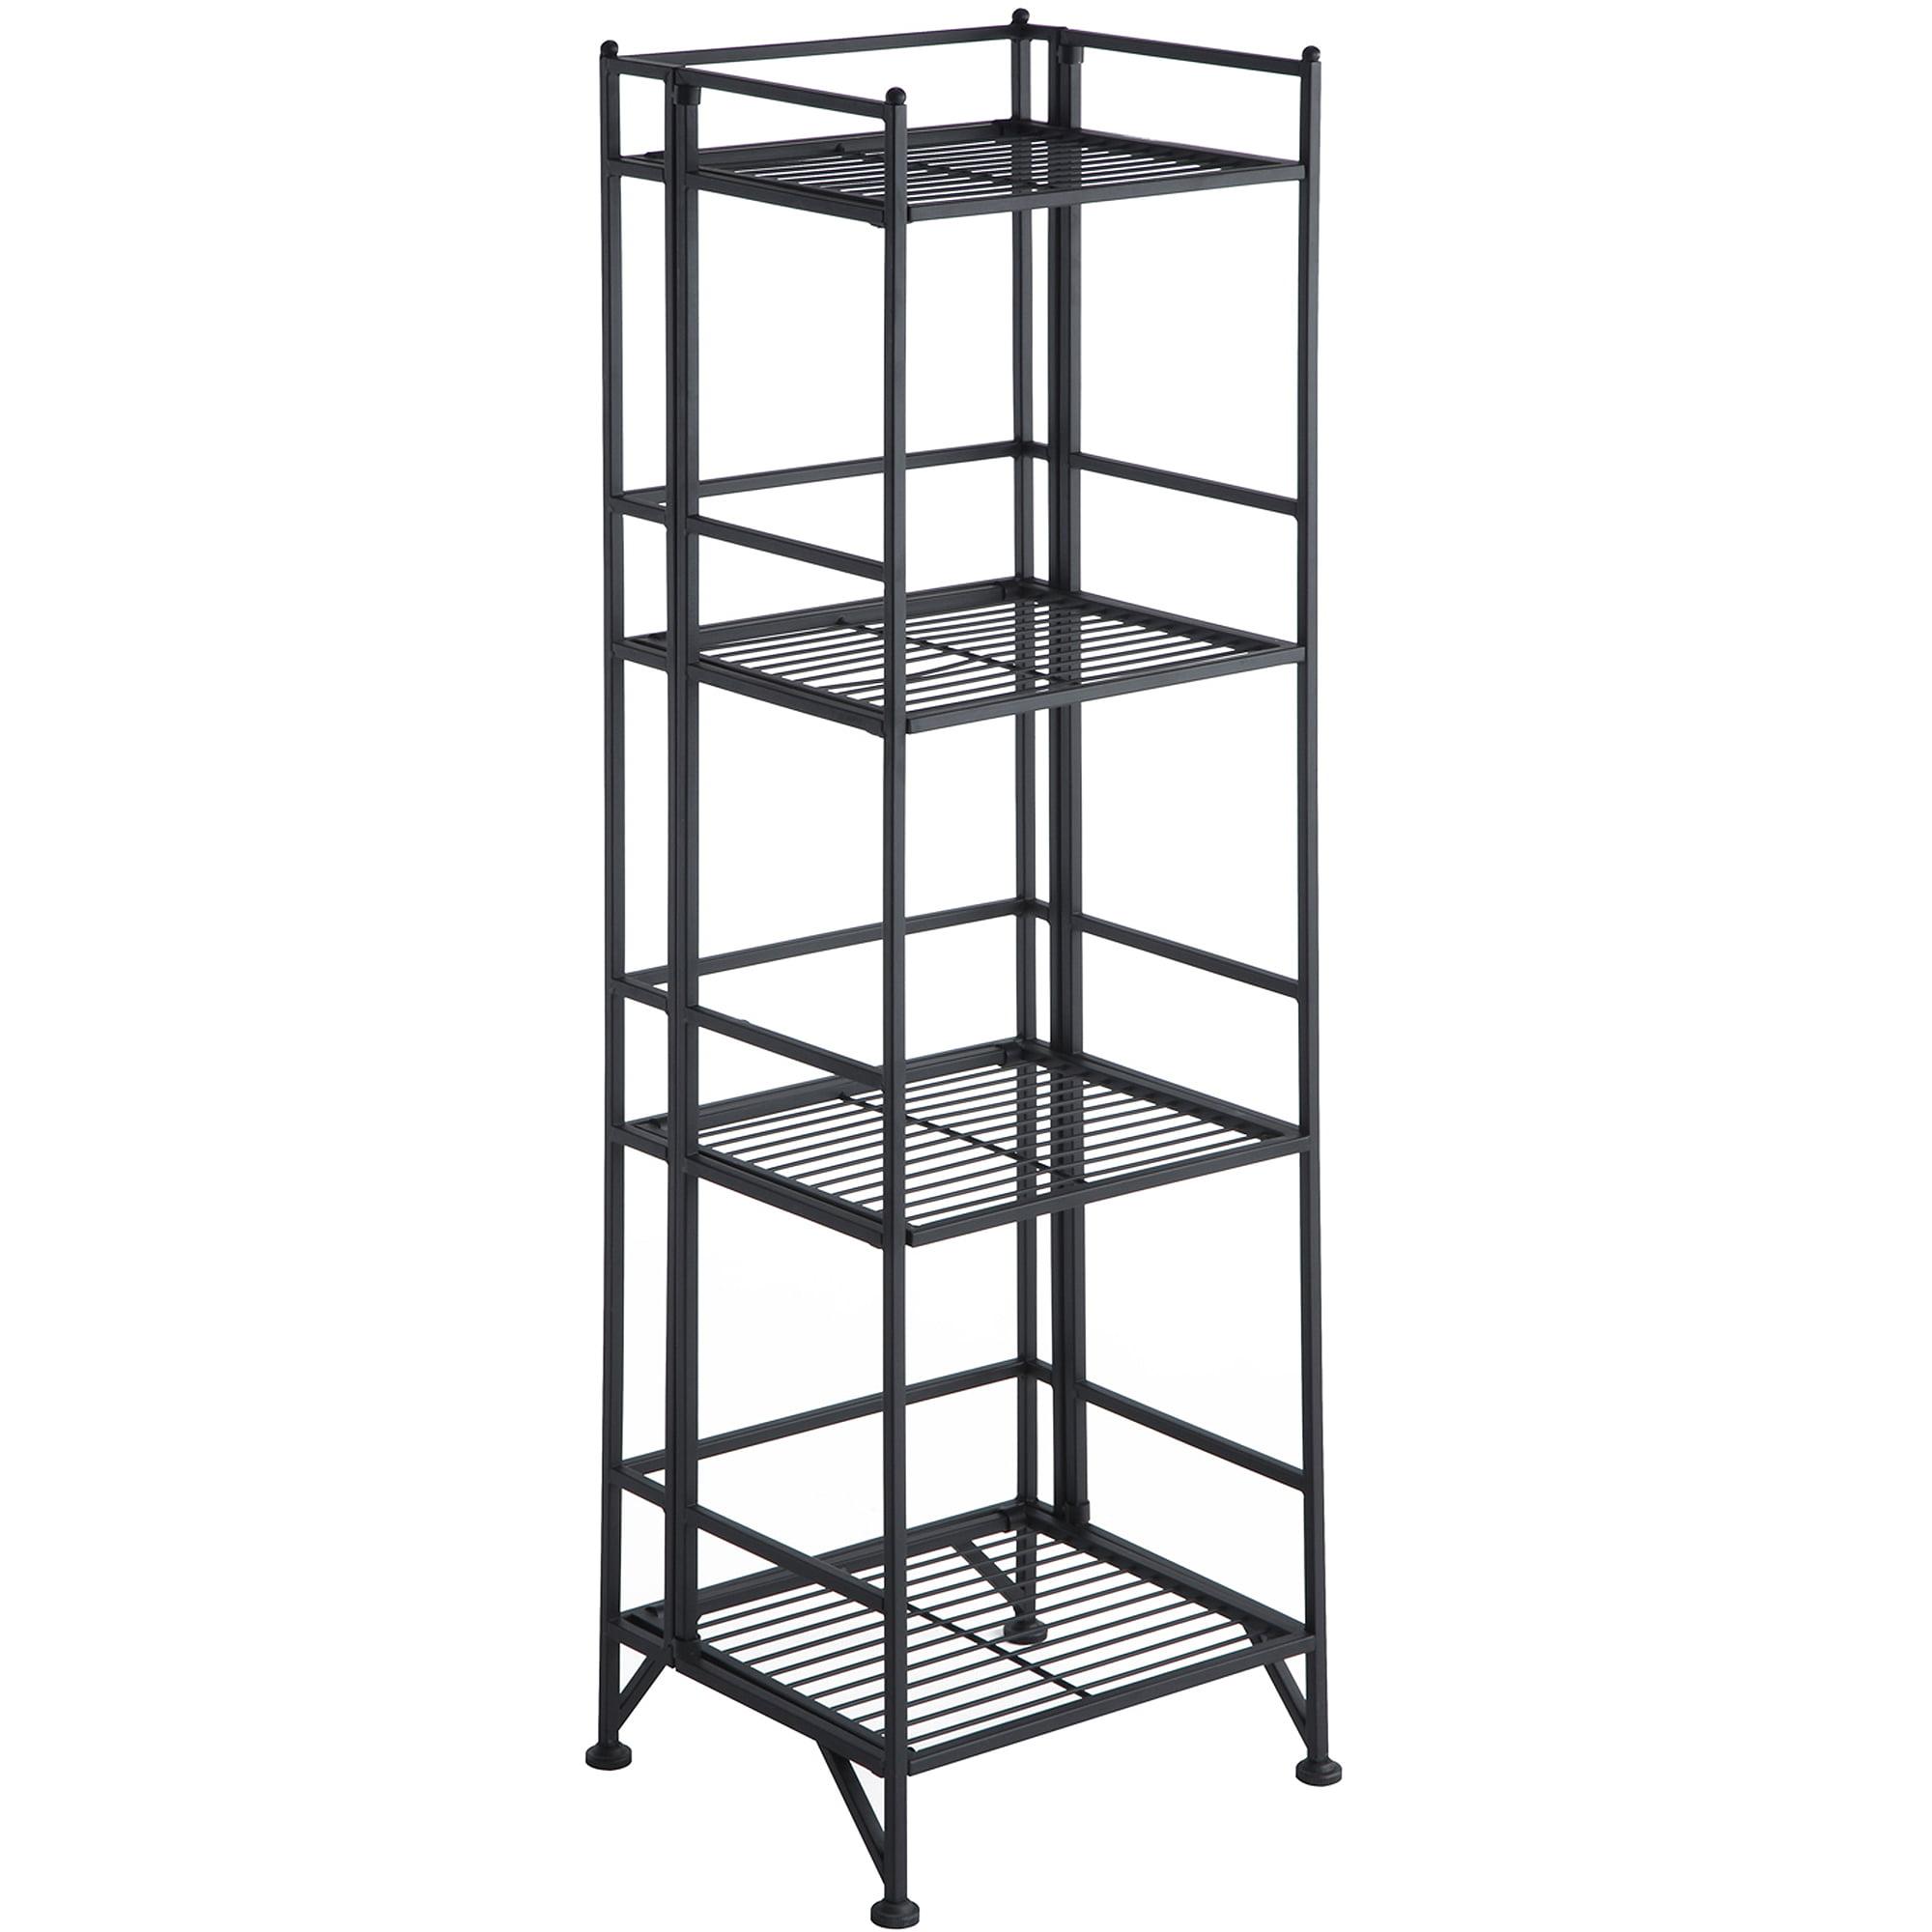 Convenience Concepts Designs2go Metal Folding 4 Shelf Bookcase Multiple Finishes